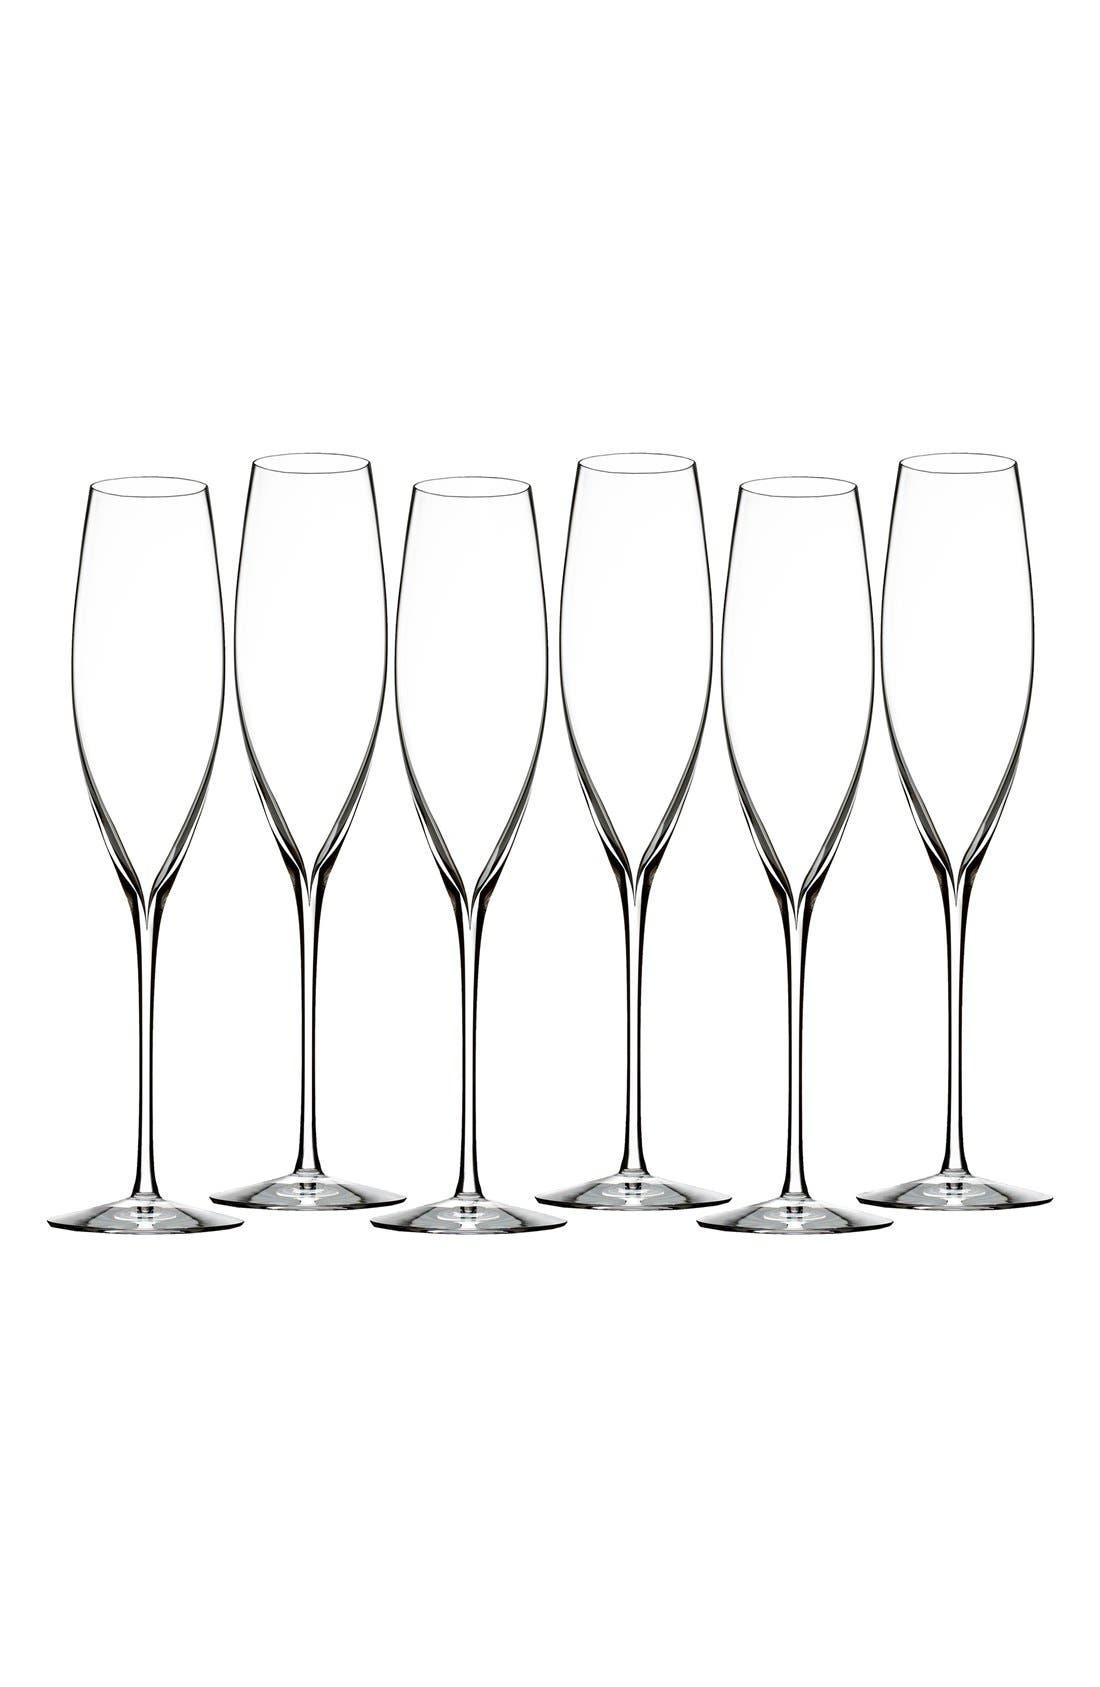 Alternate Image 1 Selected - Waterford 'Elegance' Fine Crystal Champagne Flutes (Set of 6)